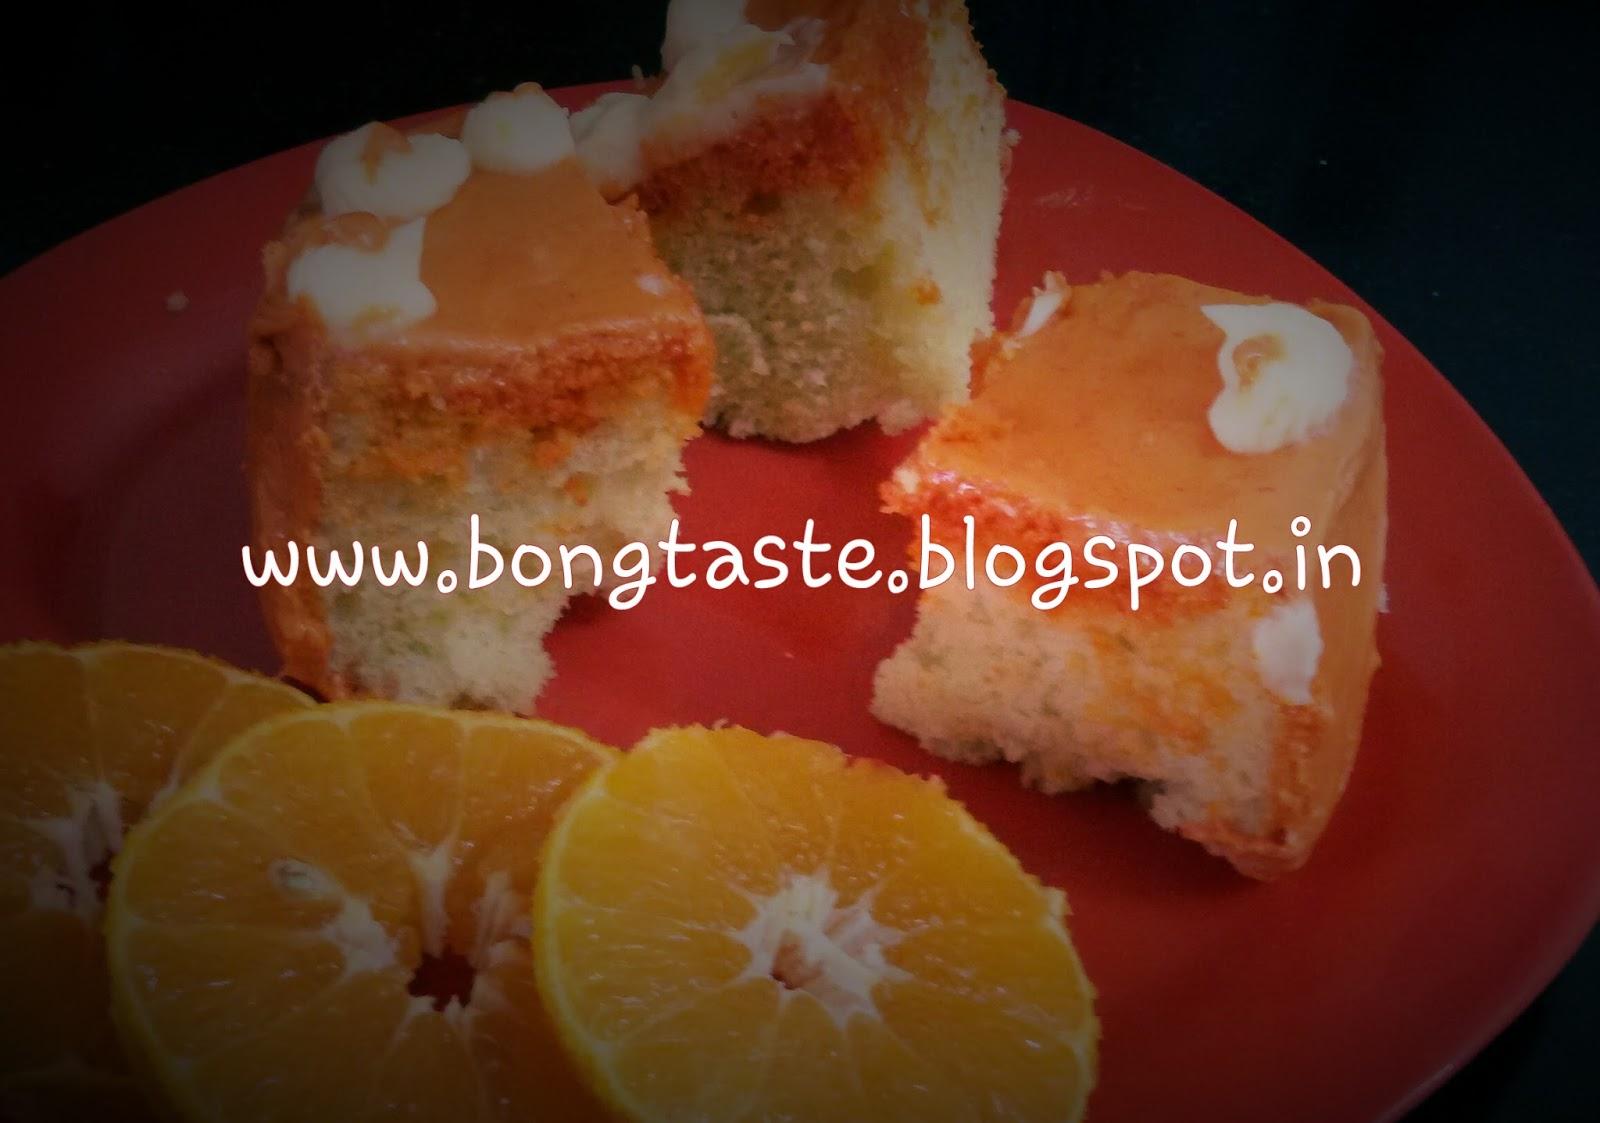 Cake Icing Recipes In Marathi: Bongtaste : ORANGE CAKE WITH ORANGE BUTTER FROSTING